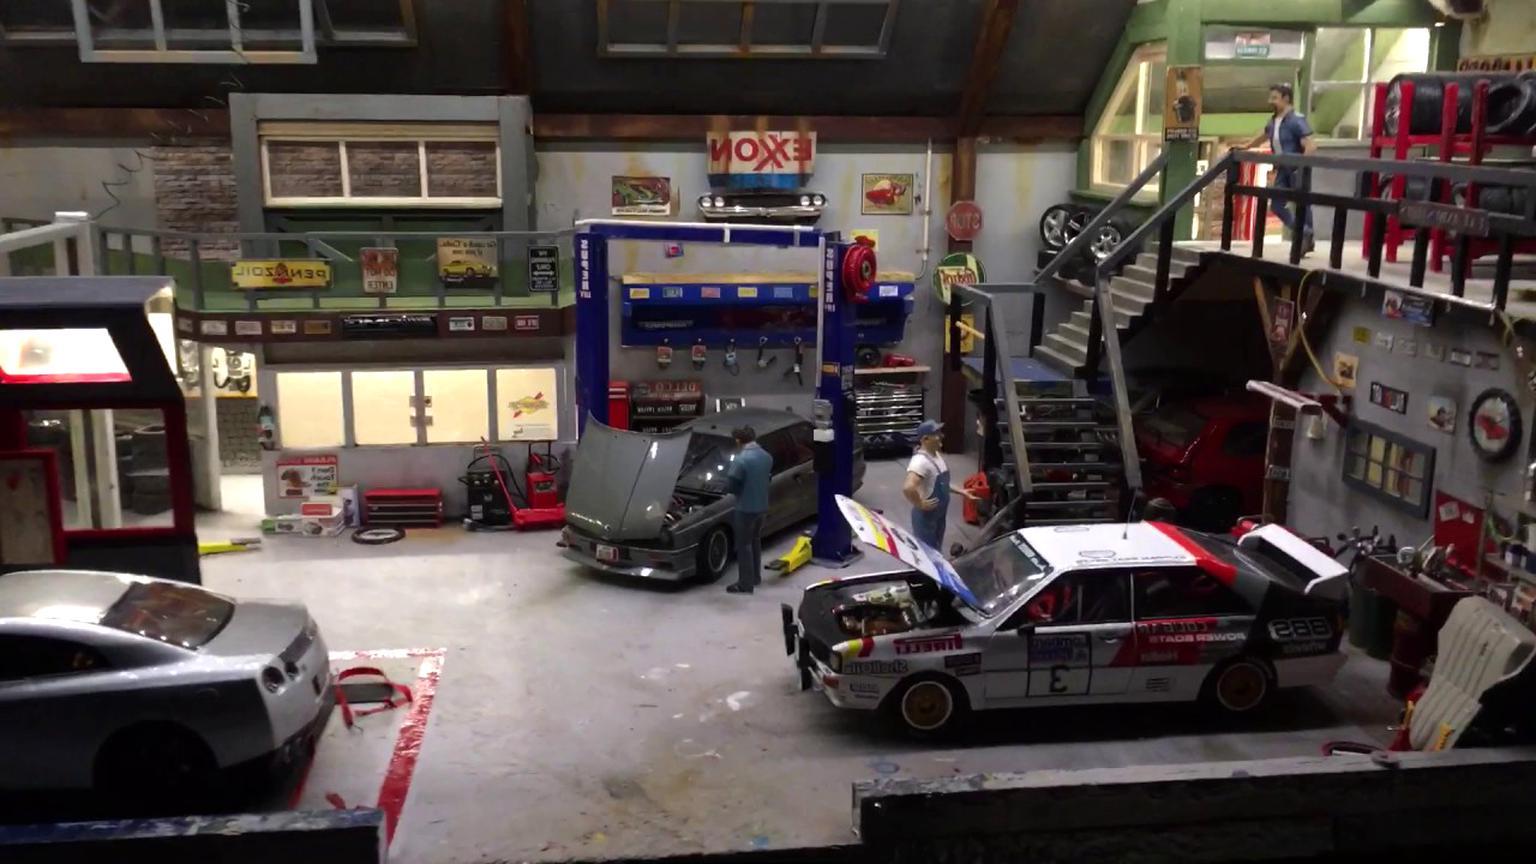 1 18 diorama for sale